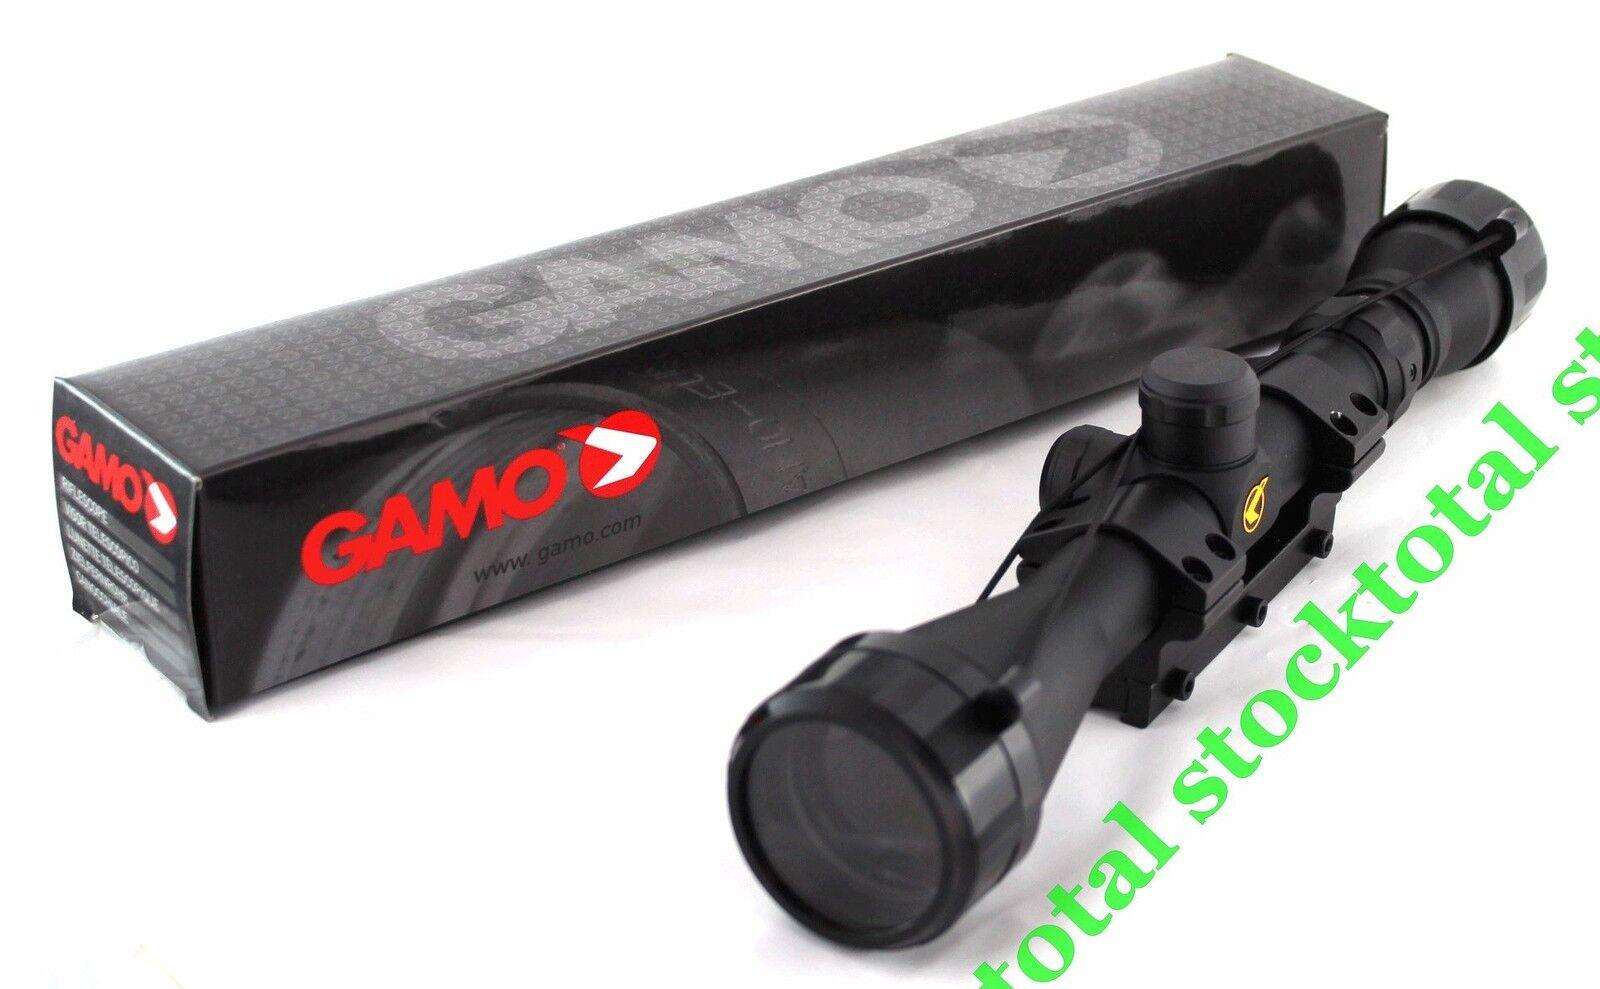 VISOR GAMO 3-9X40 WR TENEMOS TODO TODO LO DE GAMO EXPORT